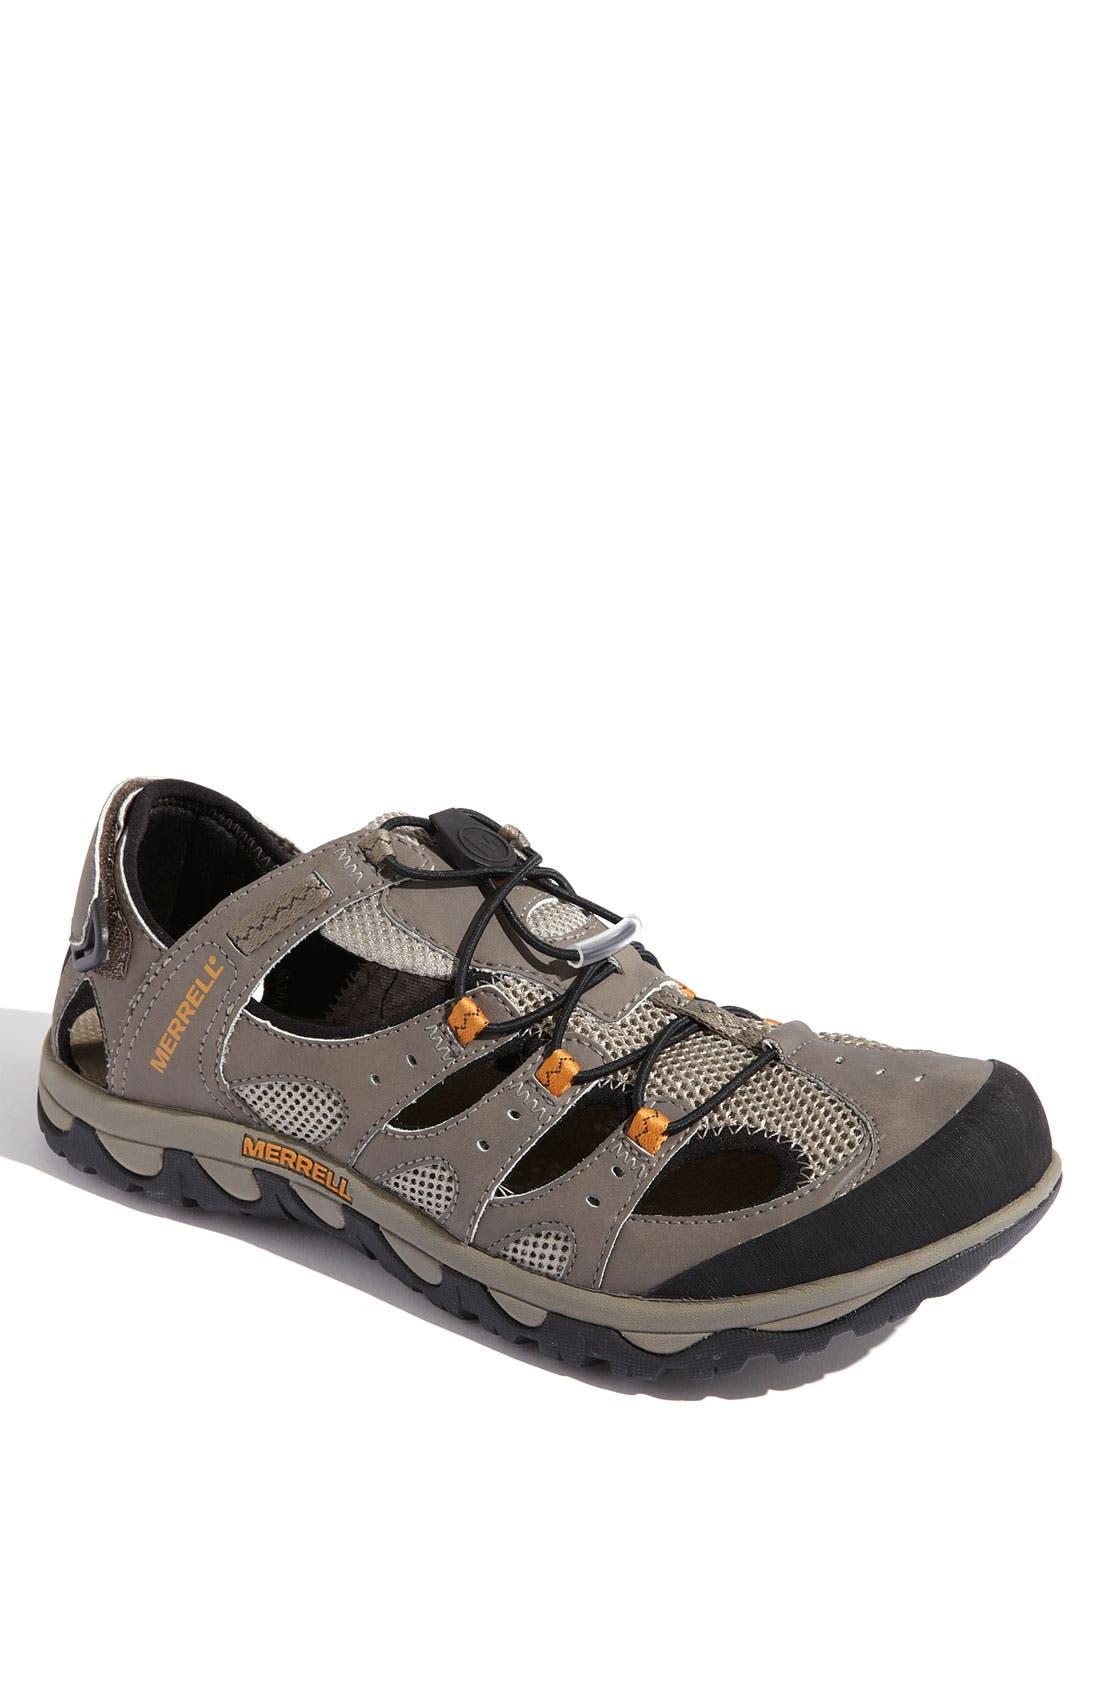 Alternate Image 1 Selected - Merrell 'Portage Web' Water Shoe (Men)